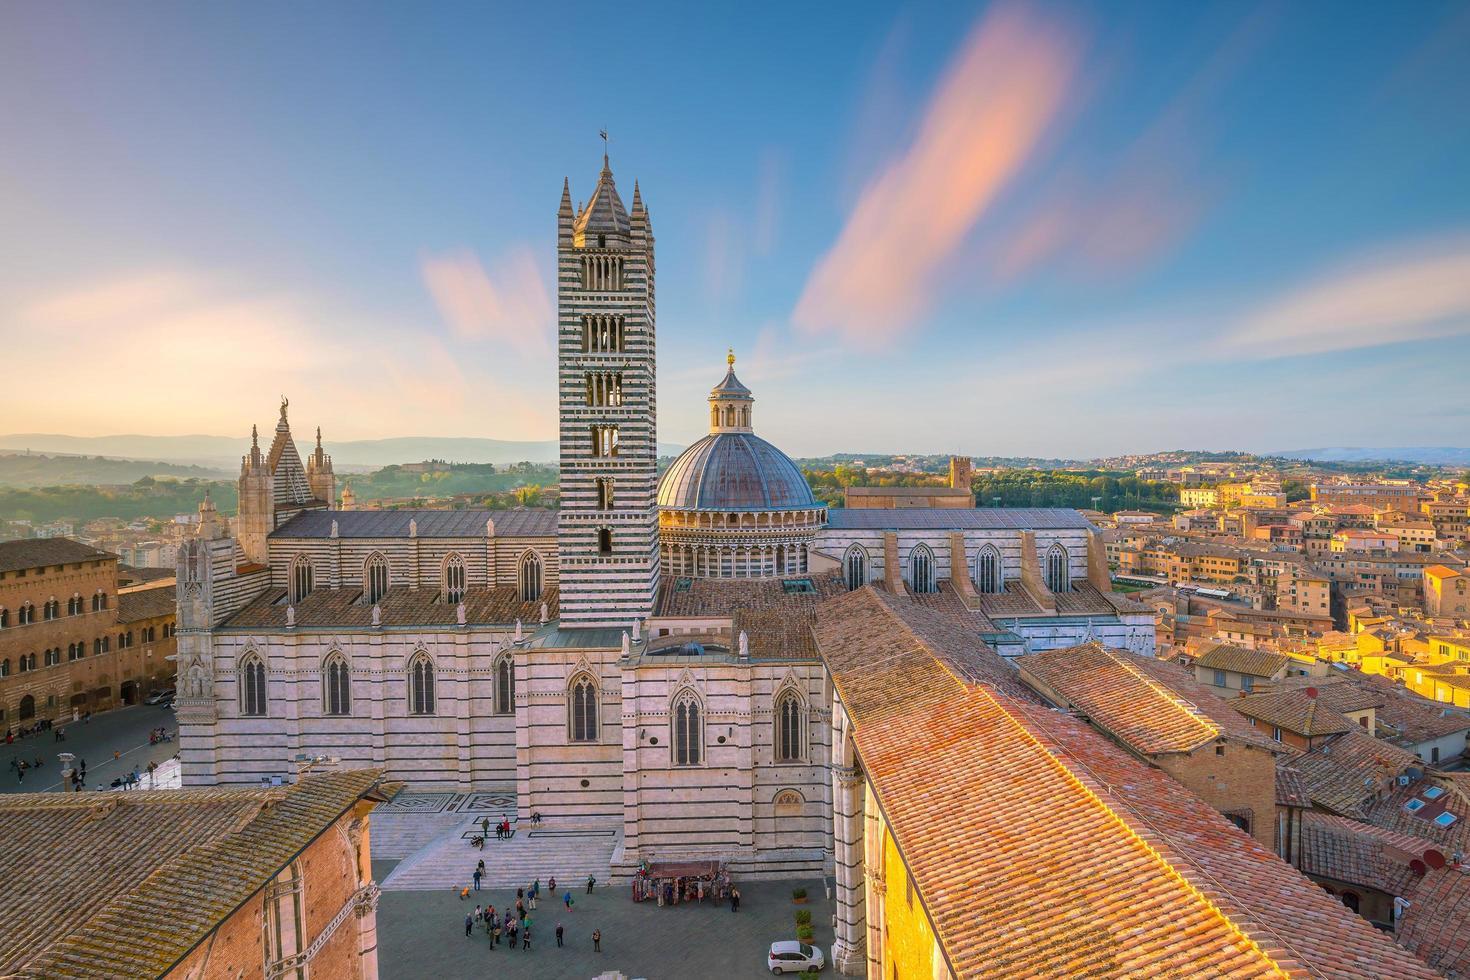 Duomo di Siena or Metropolitan Cathedral of Santa Maria Assunta in Siena, Italy. photo